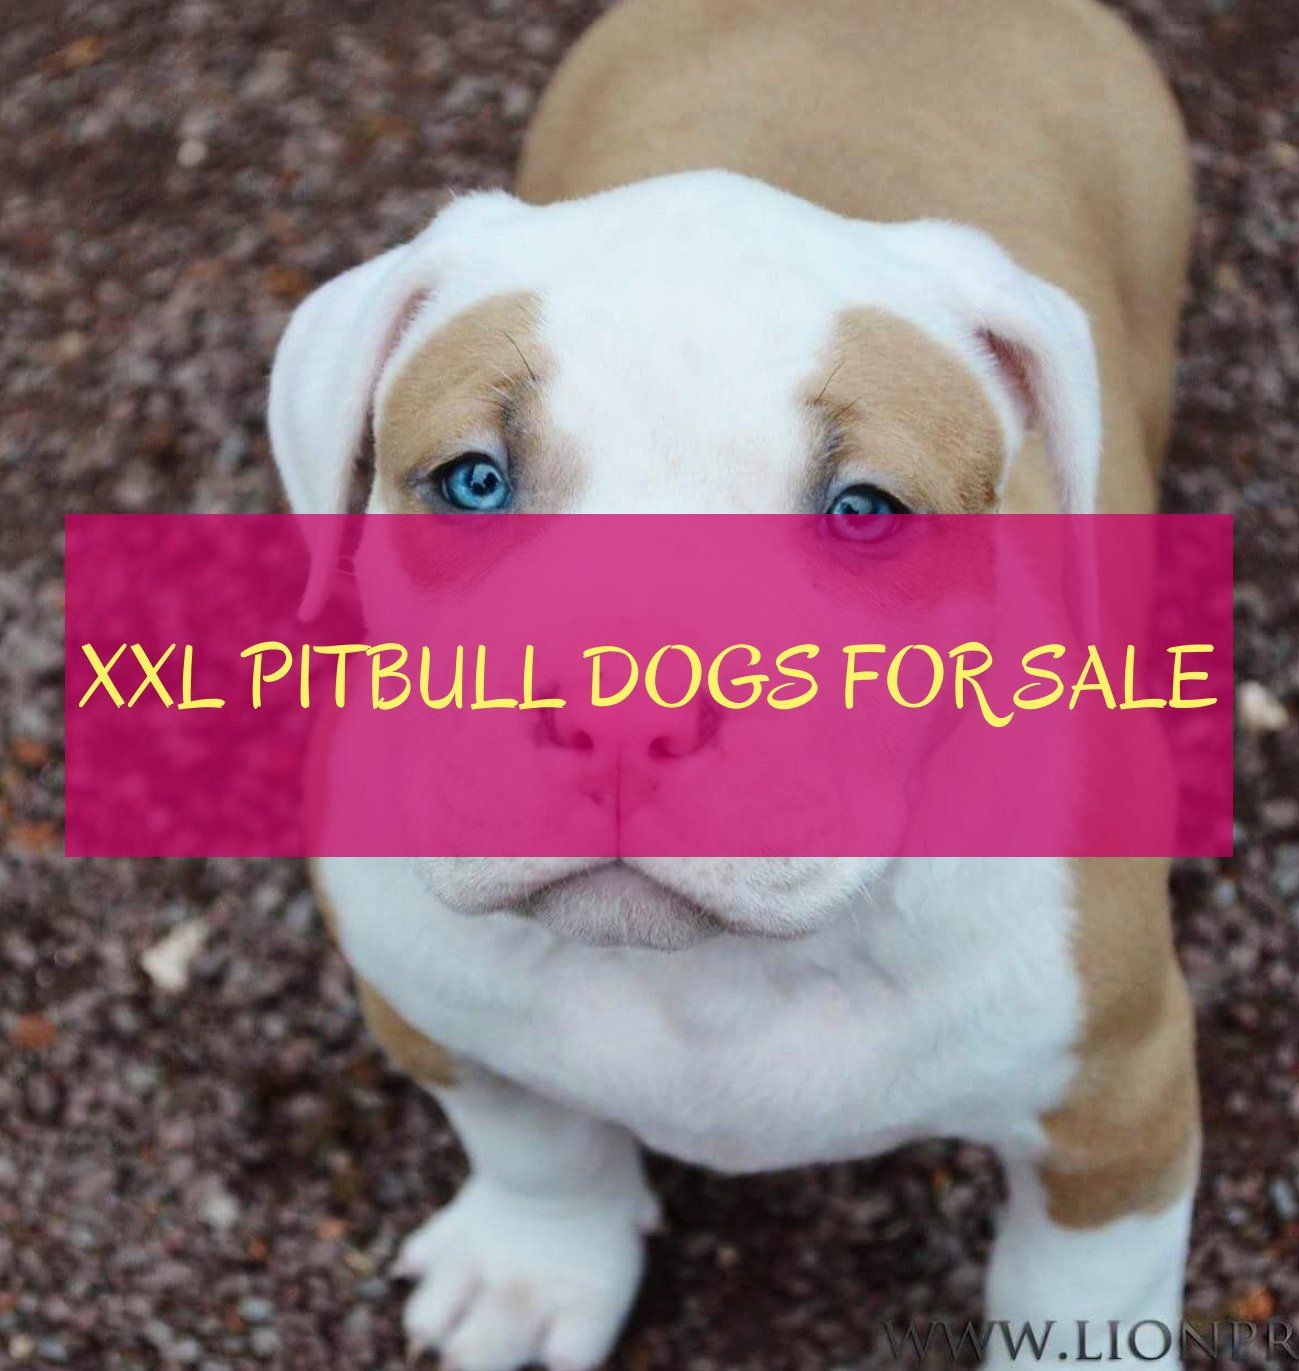 xxl pitbull hunde zu verkaufen  xxl pitbull dogs for sale